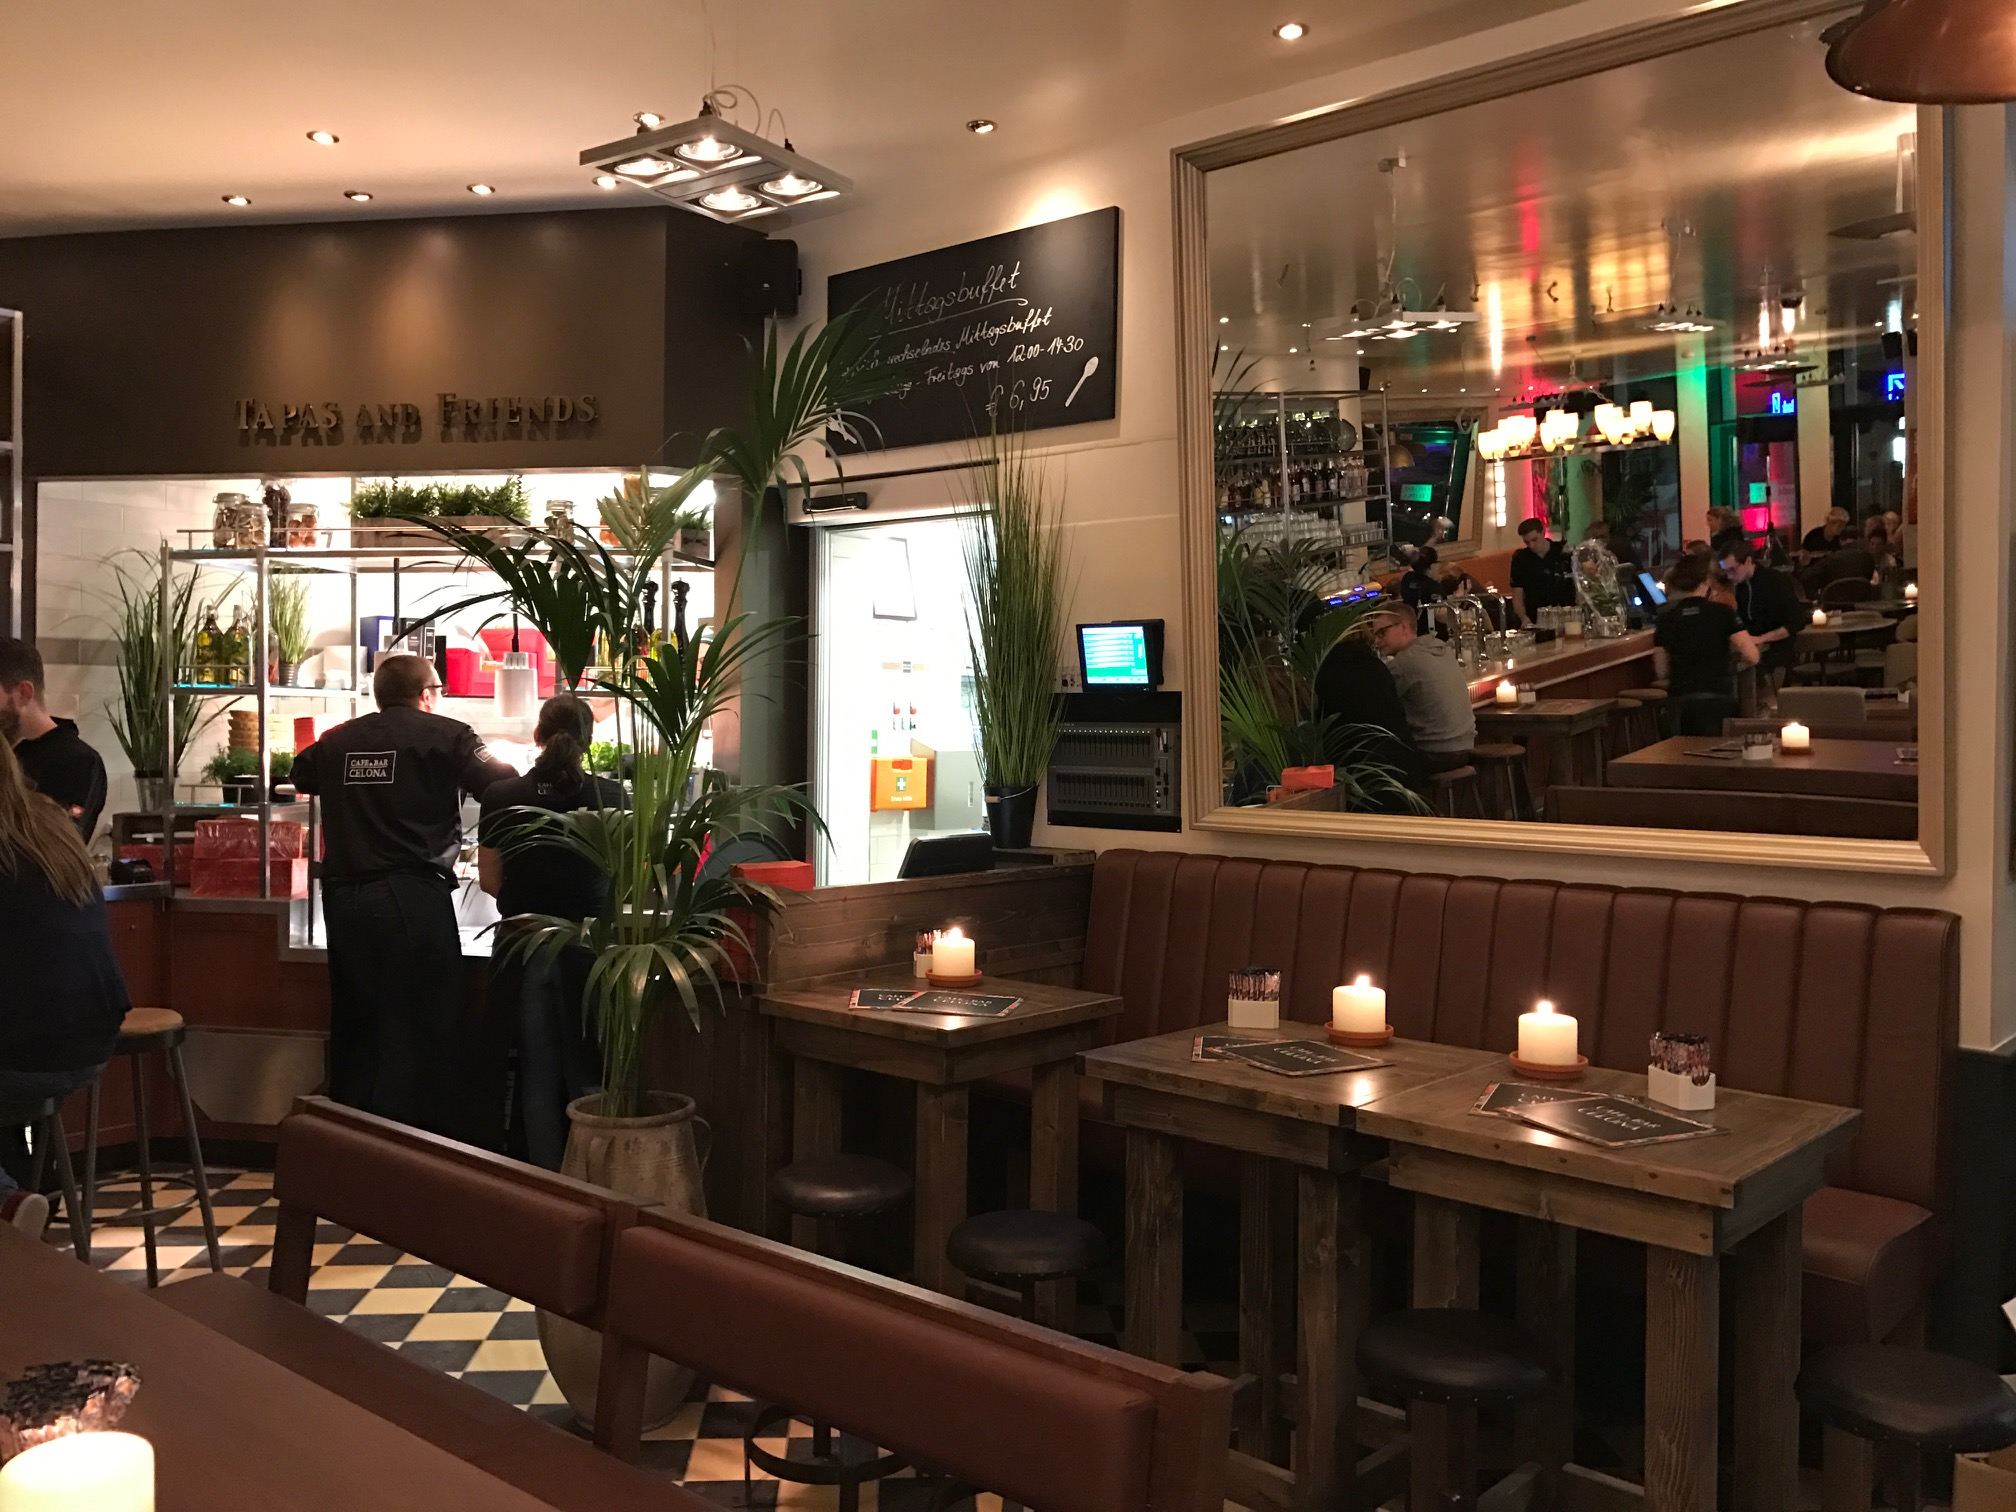 Cafe & Bar Celona Leer - Cafe & Bar Celona